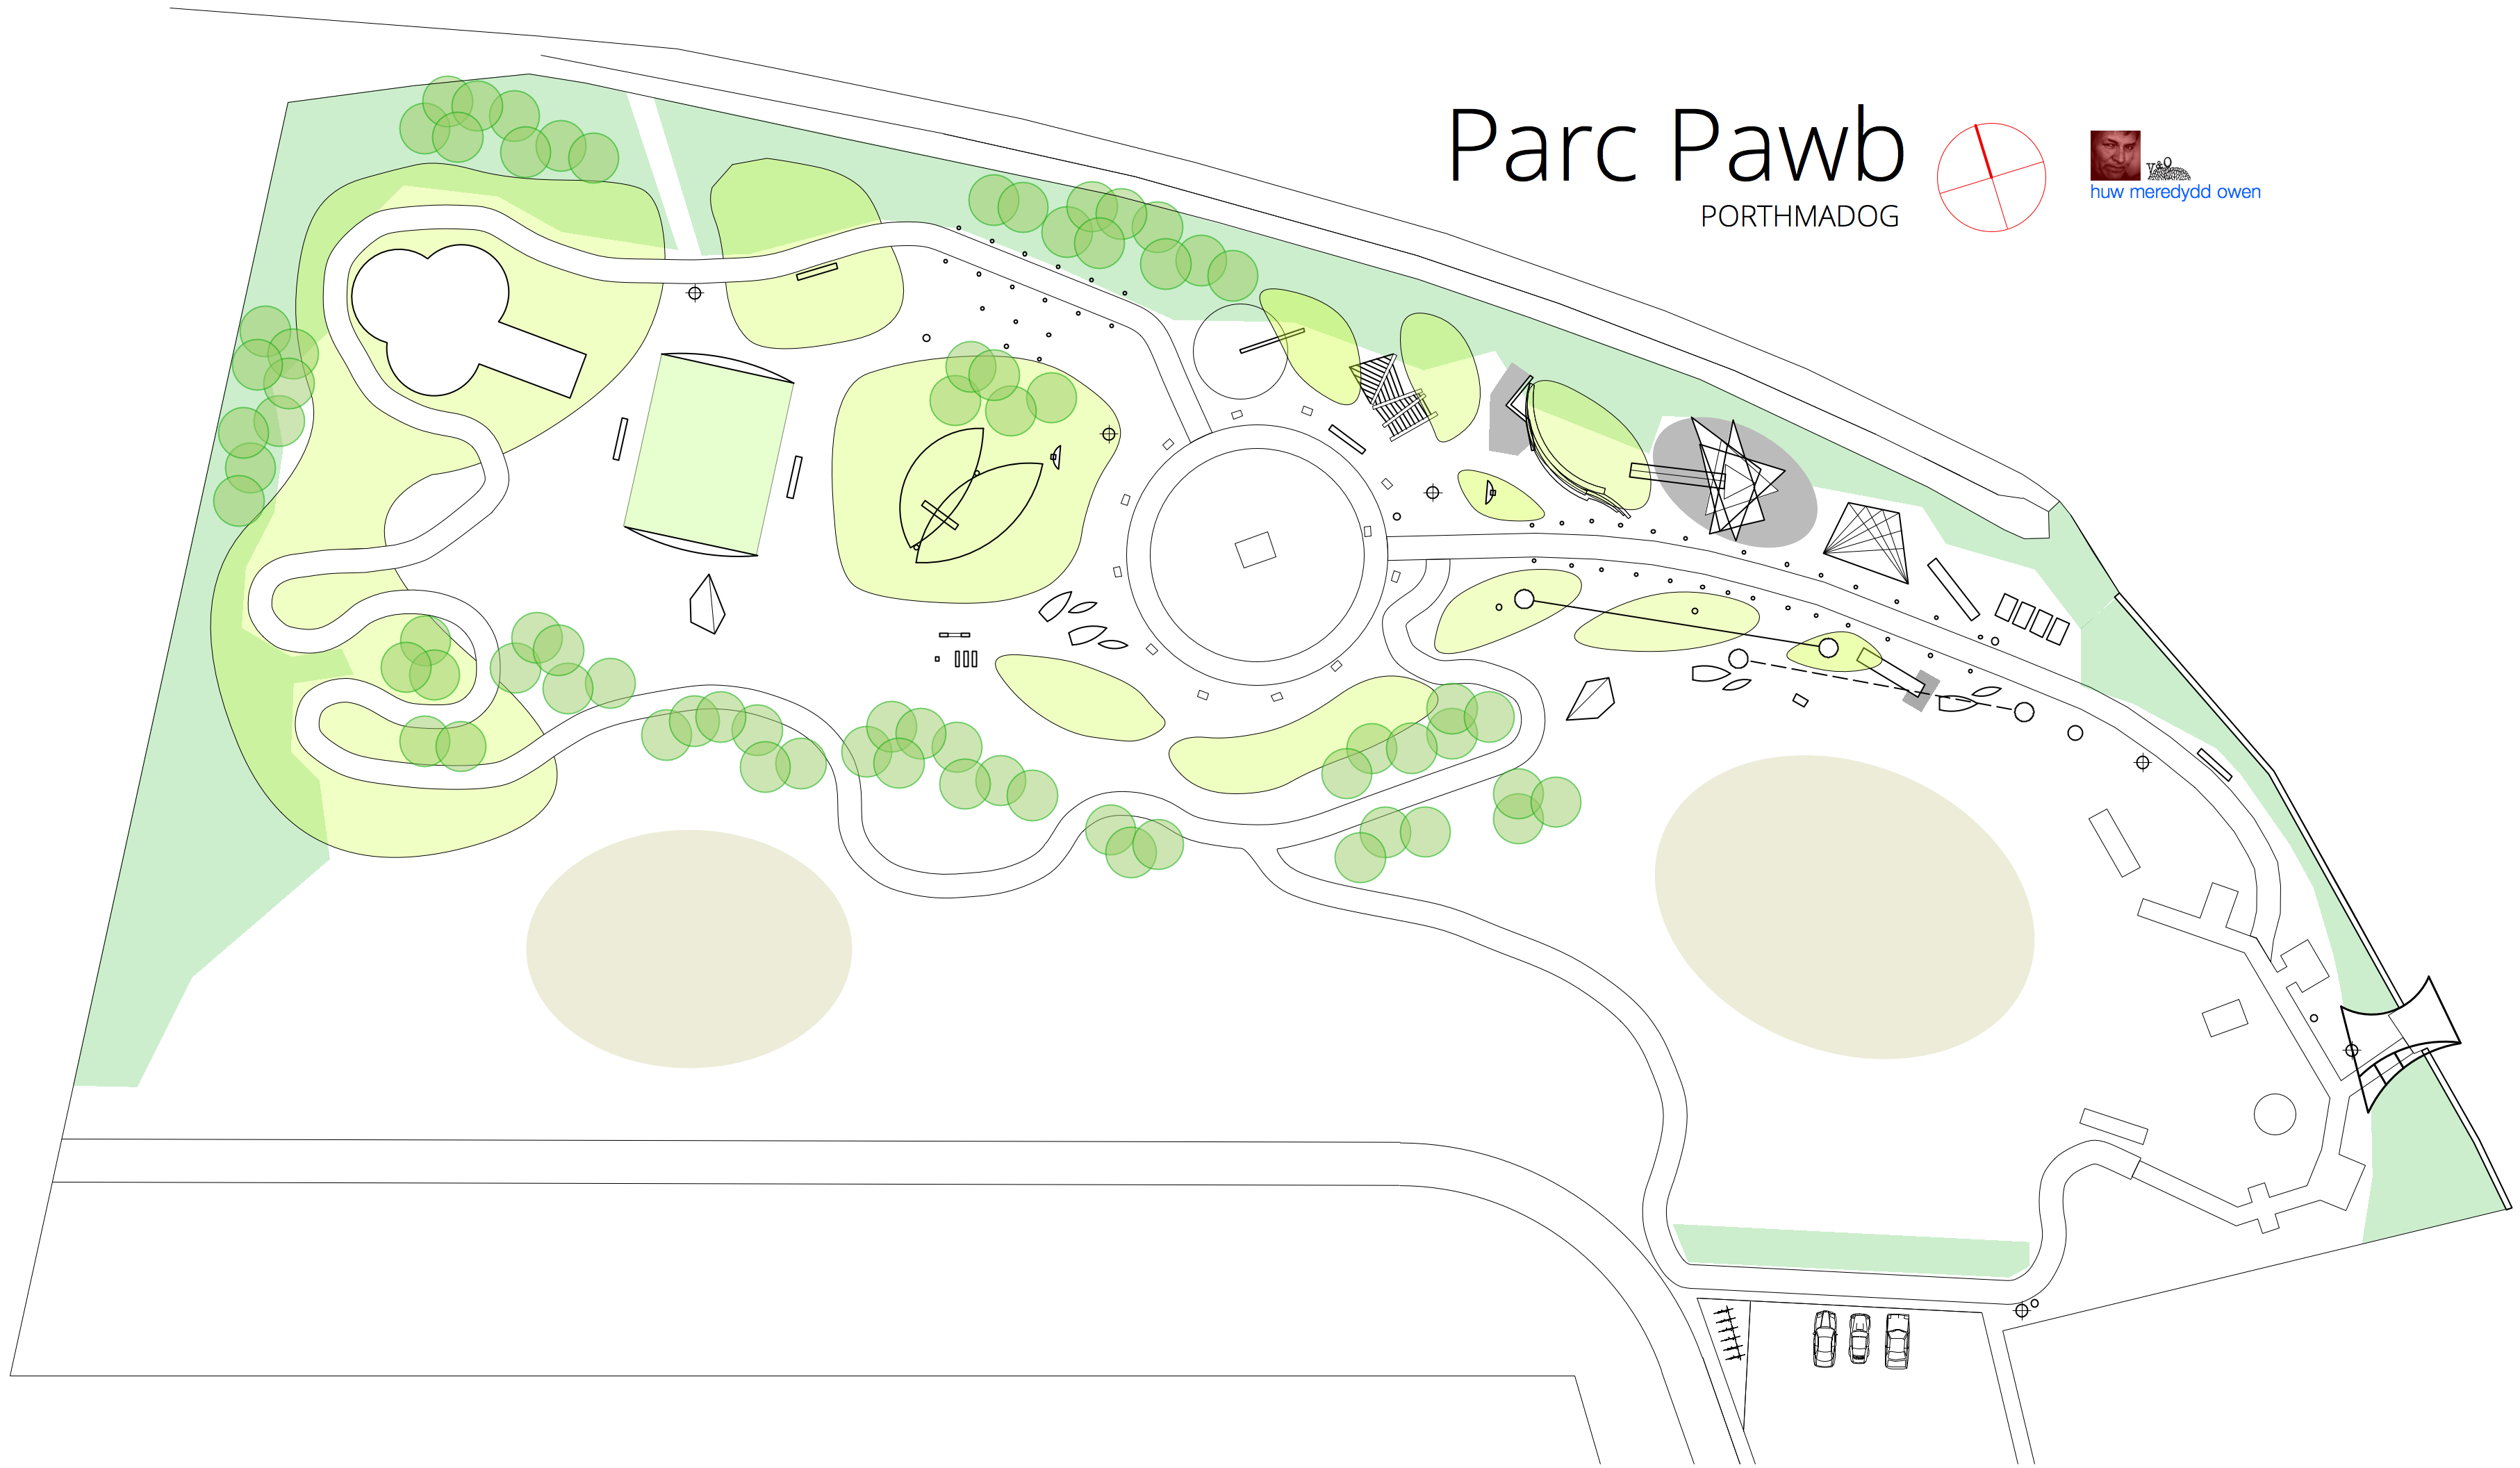 parc_pawb_1.jpg